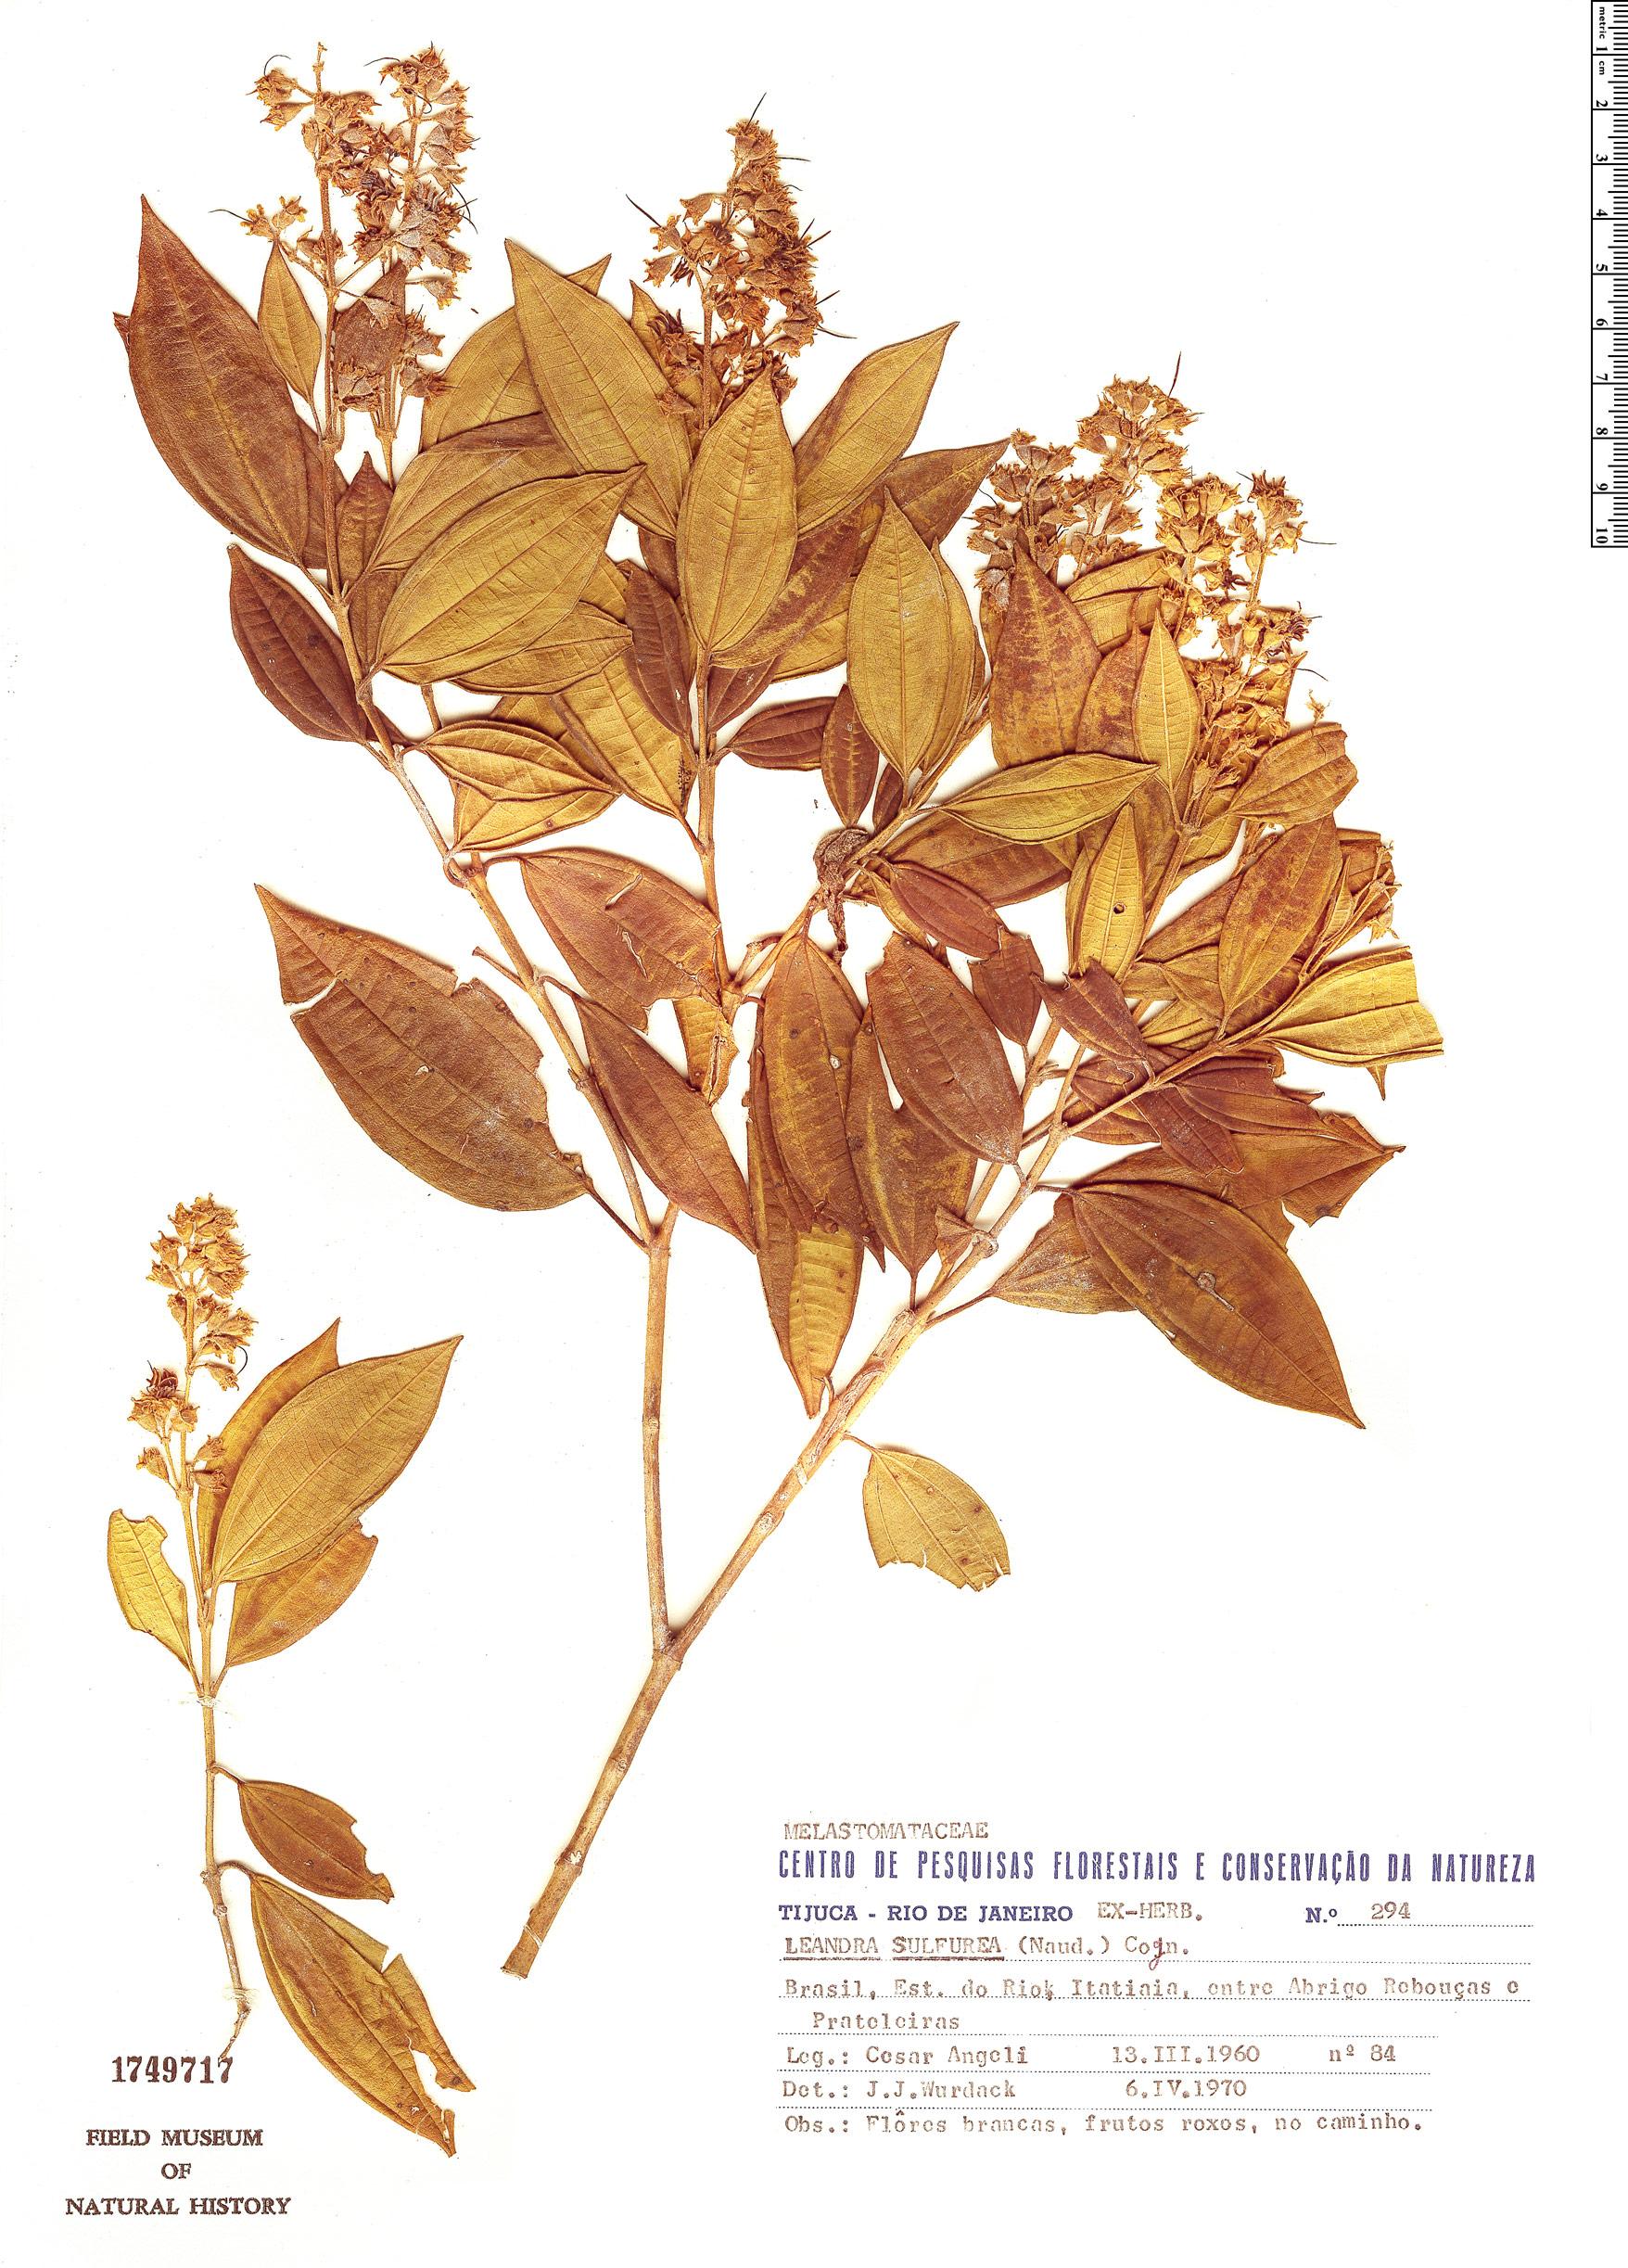 Specimen: Leandra sulfurea